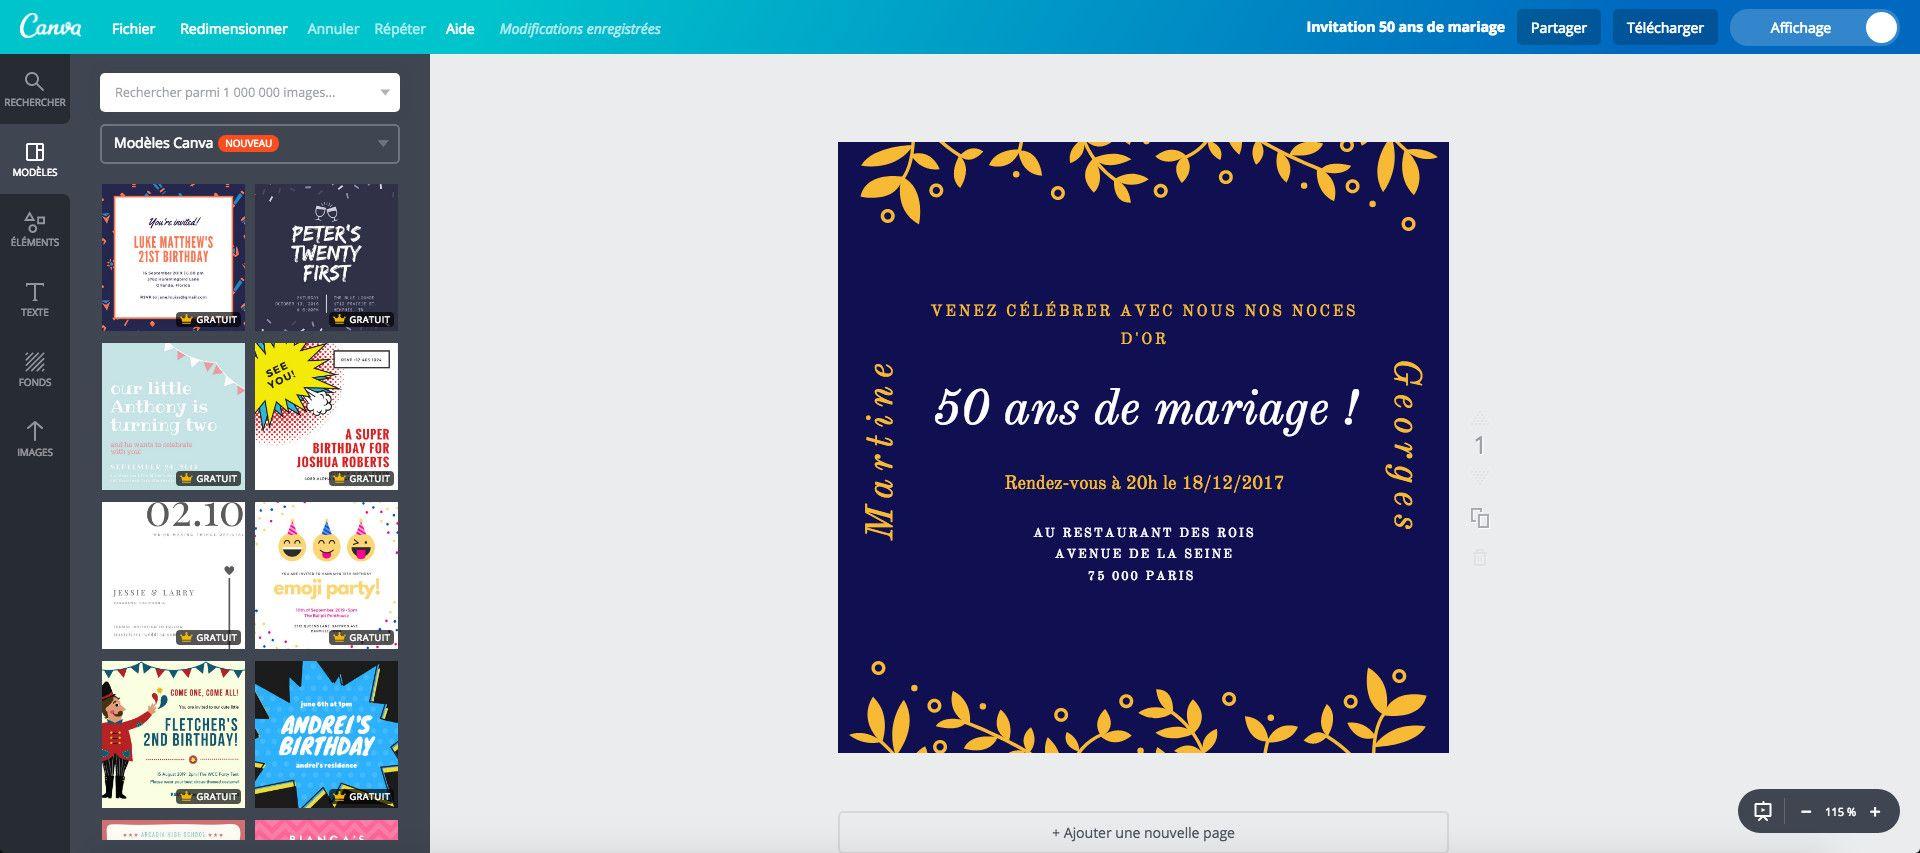 Texte Félicitations 50 Ans De Mariage Noces D'or